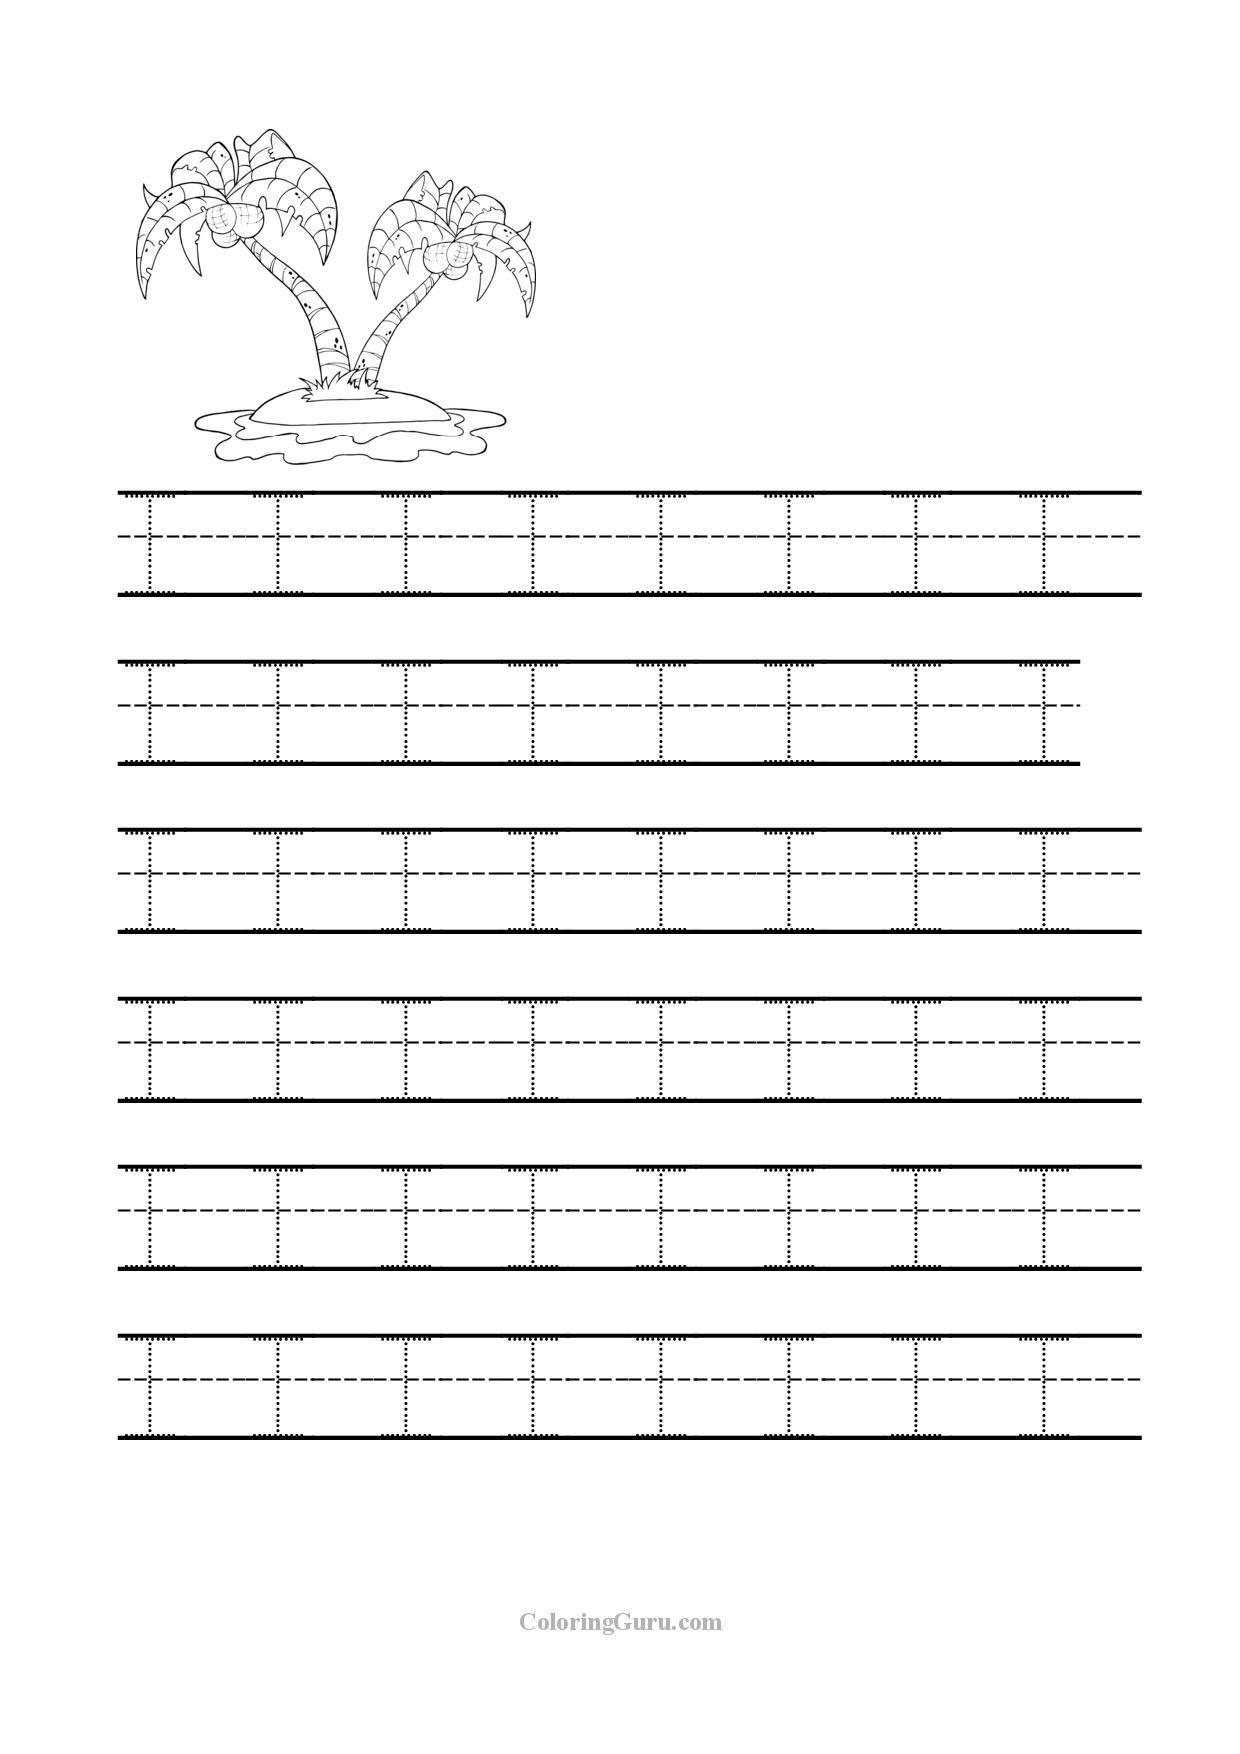 Free Printable Tracing Letter I Worksheets For Preschool